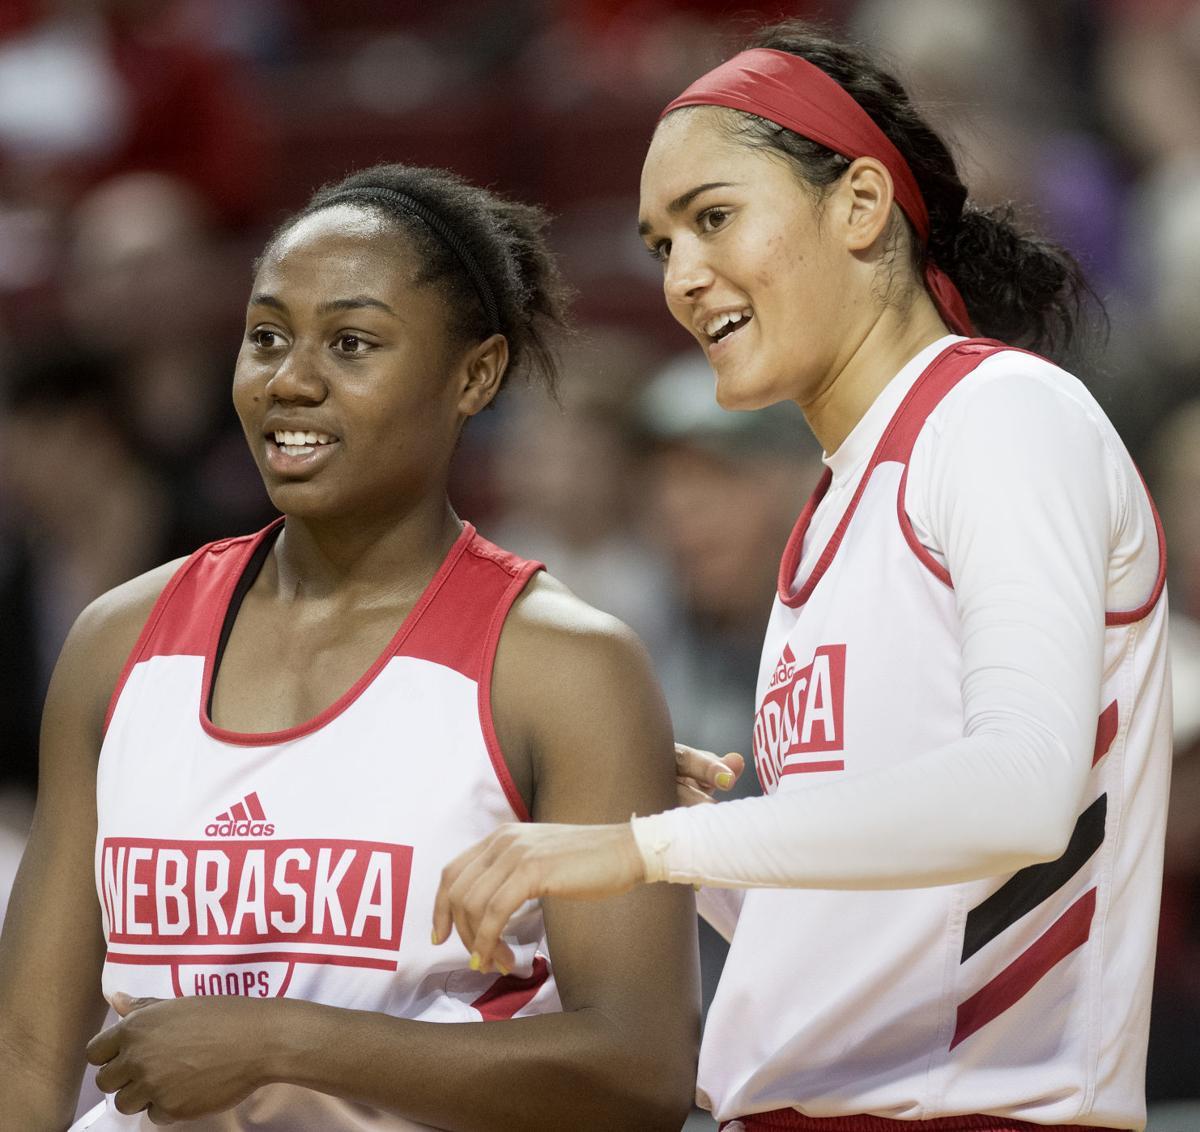 Nebraska Women's Basketball Open Practice, 10.23.18